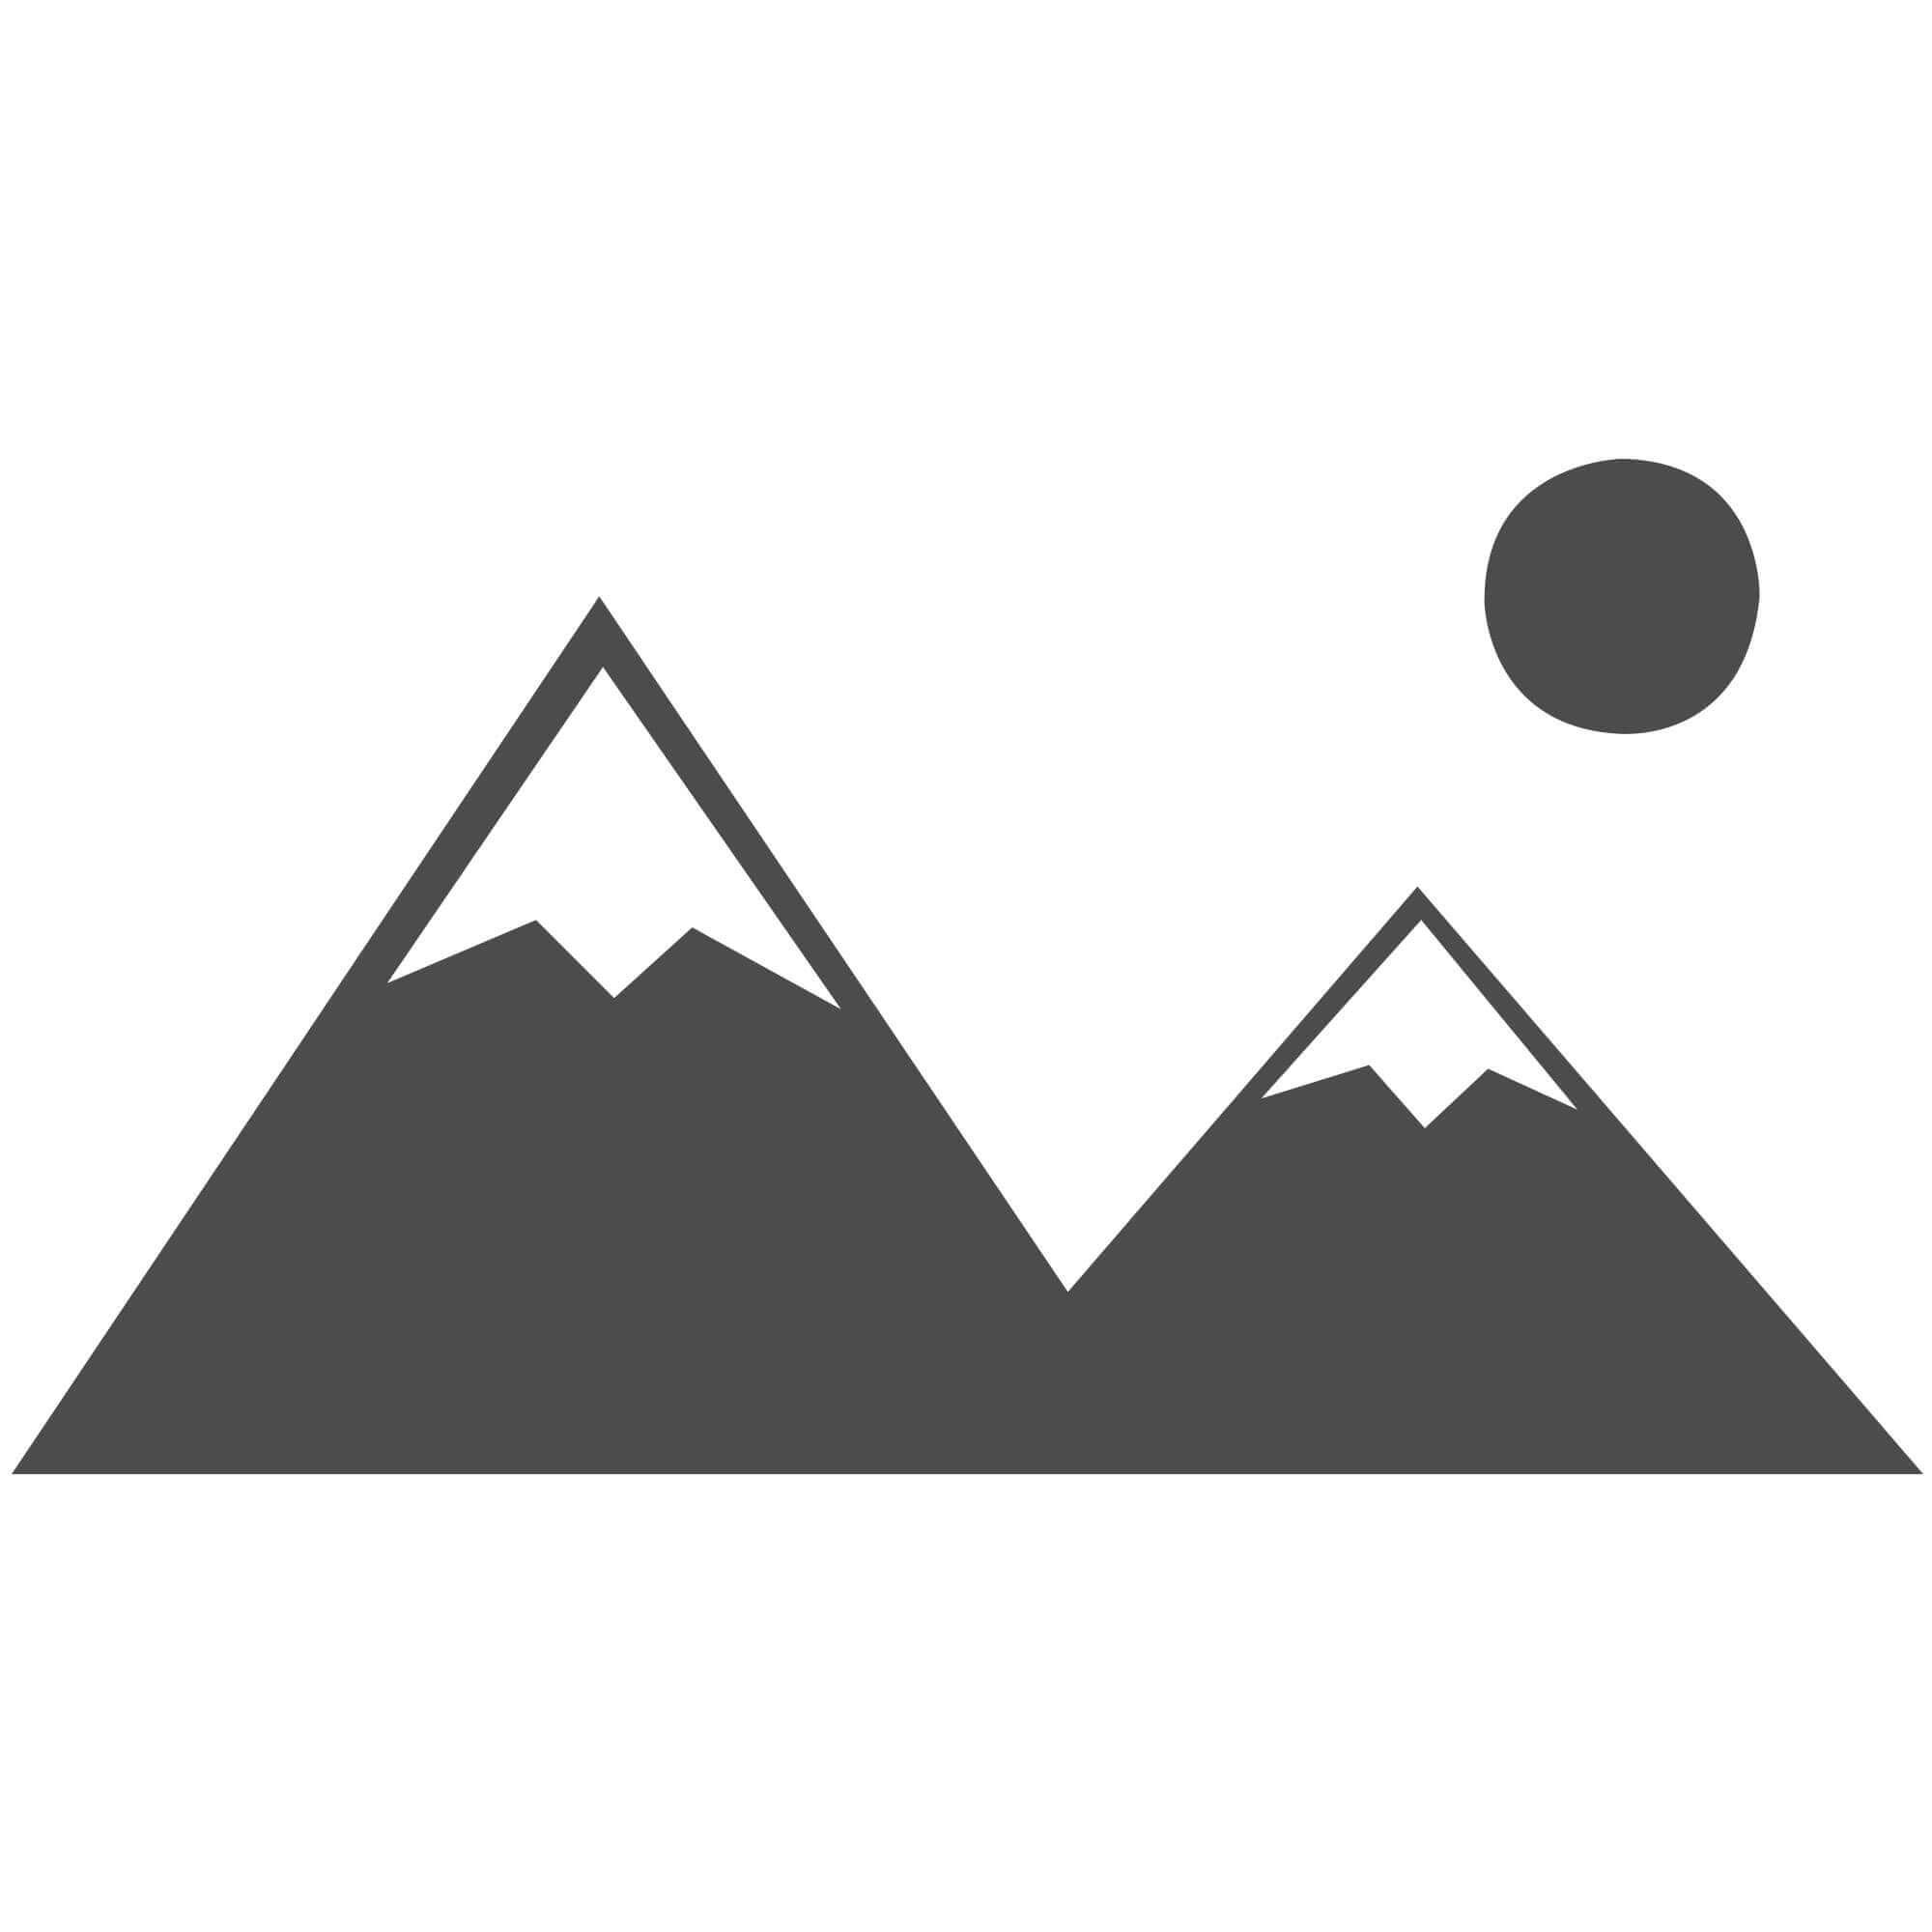 "Athena Shaggy Rug - Charcoal Grey - Size 80 x 150 cm (2'8"" x 5')"